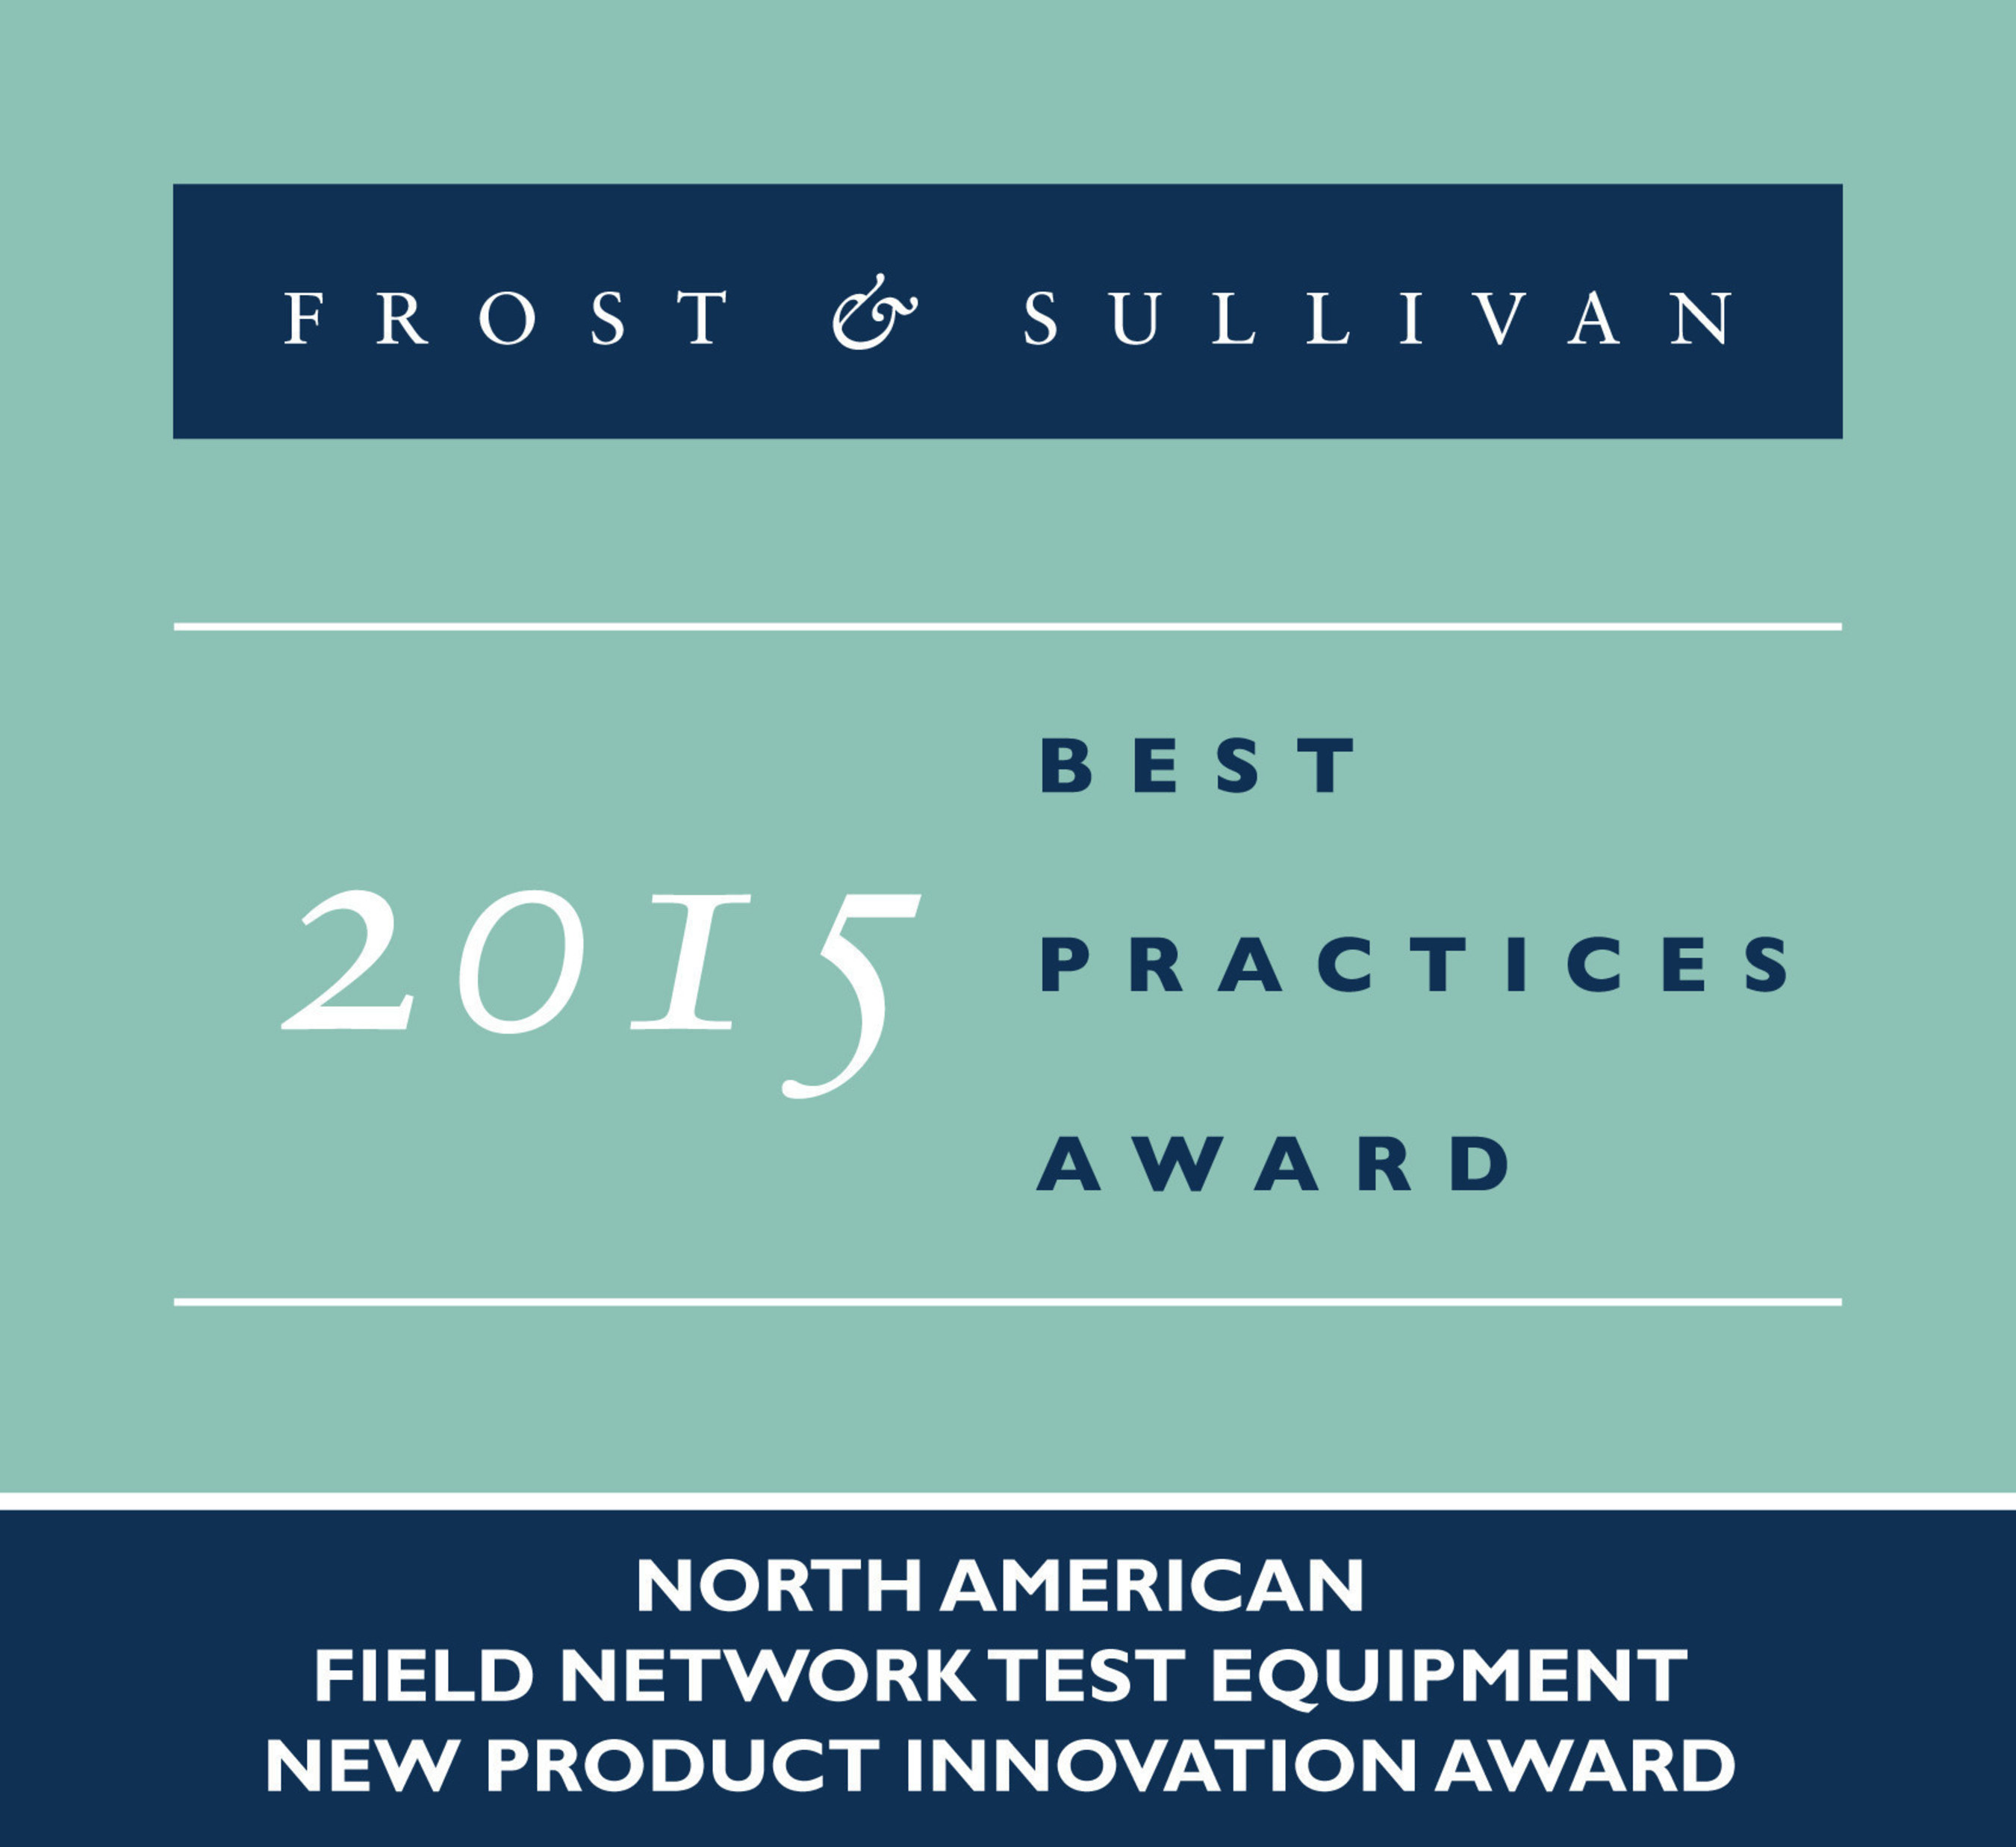 Frost & Sullivan Extols Deviser Instruments' Leading-edge PROFILER Range of Analyzers for the Field